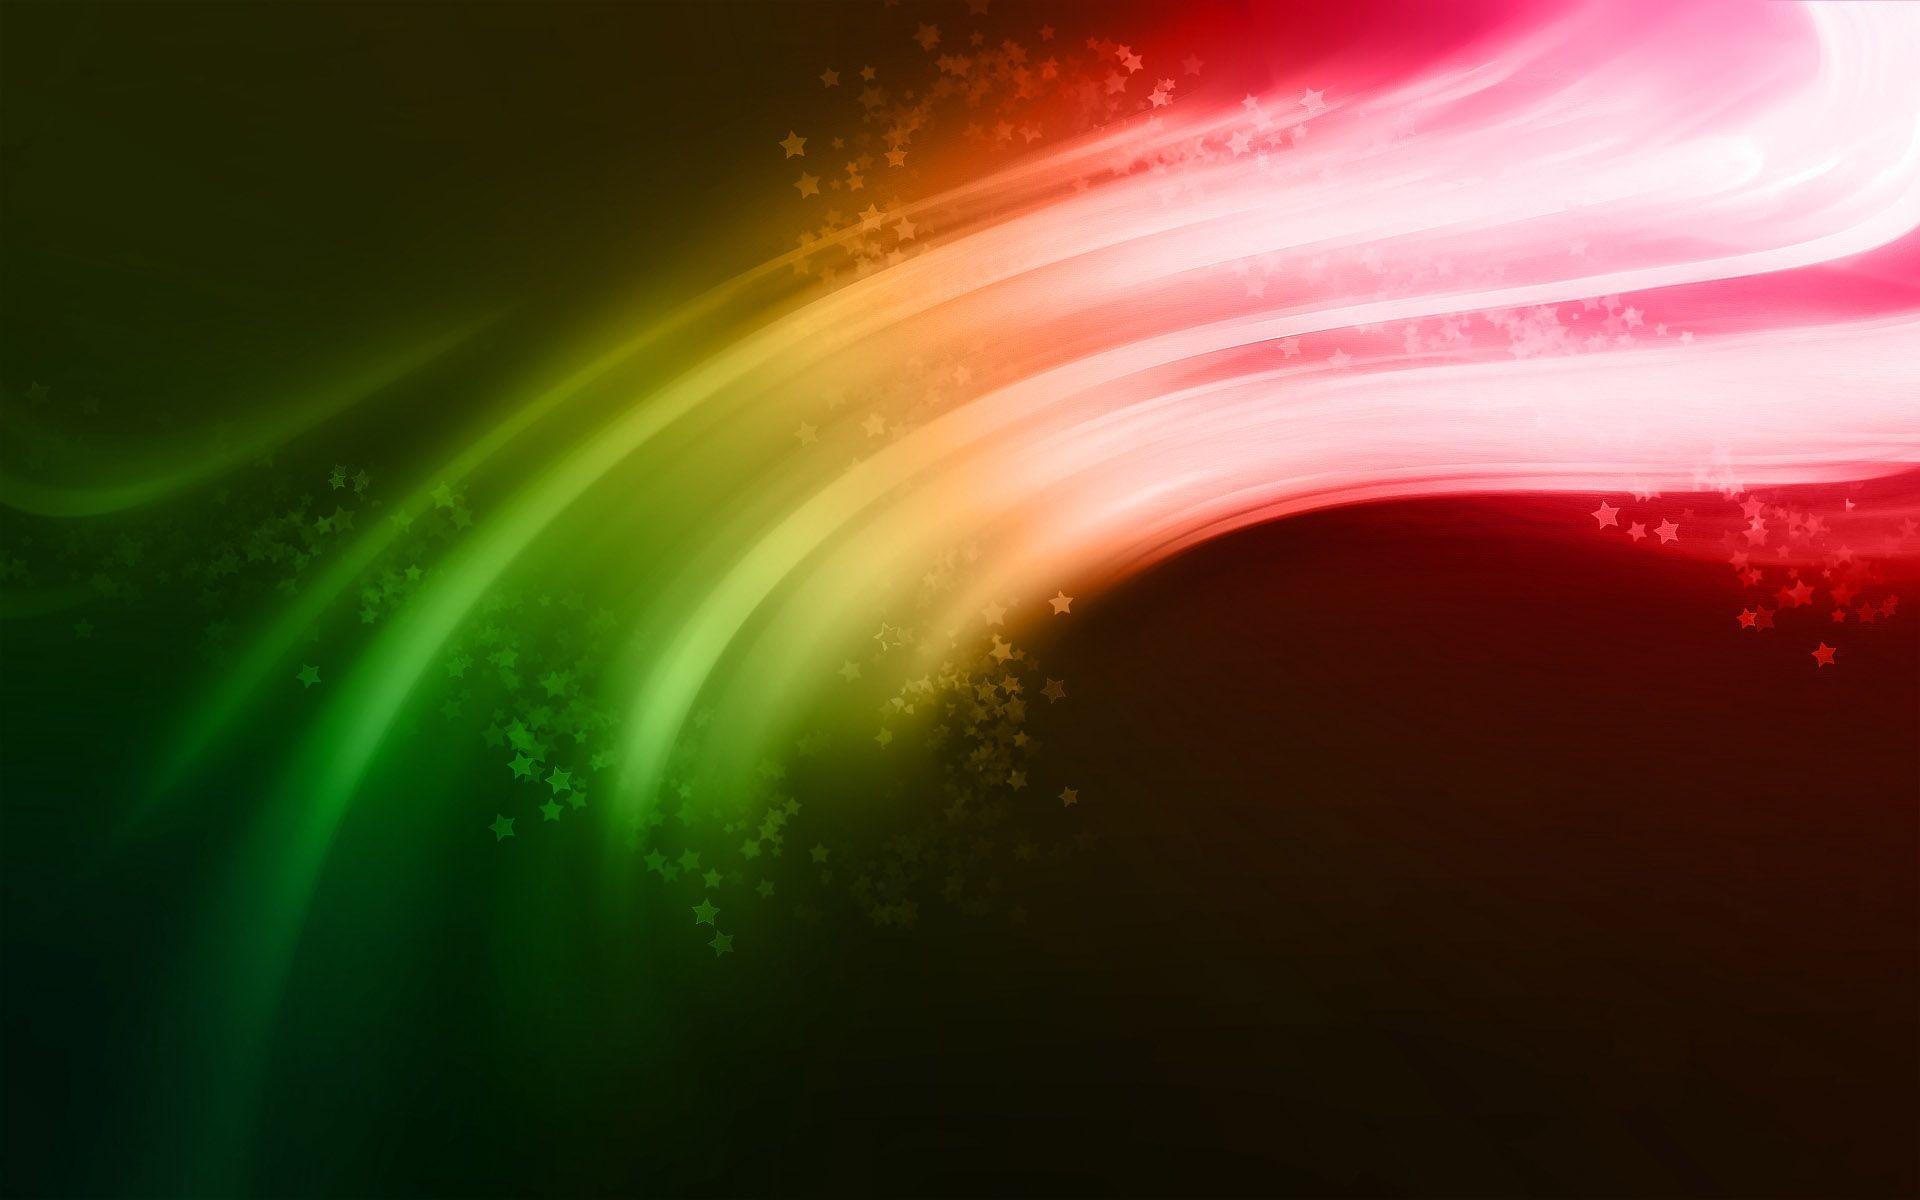 Abstract HD Wallpaper